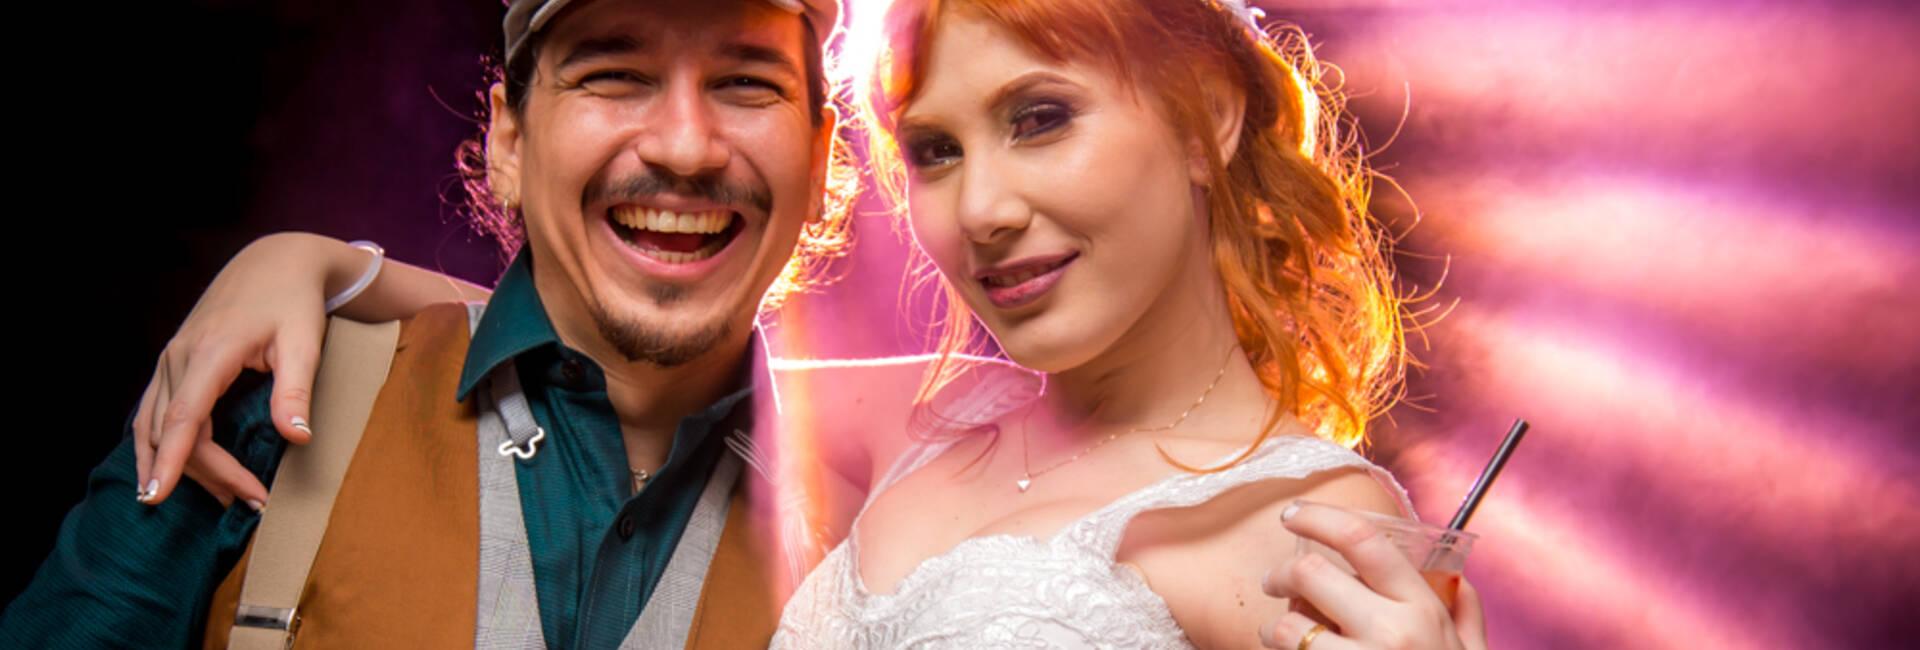 Casamento de Kelly e Anderson